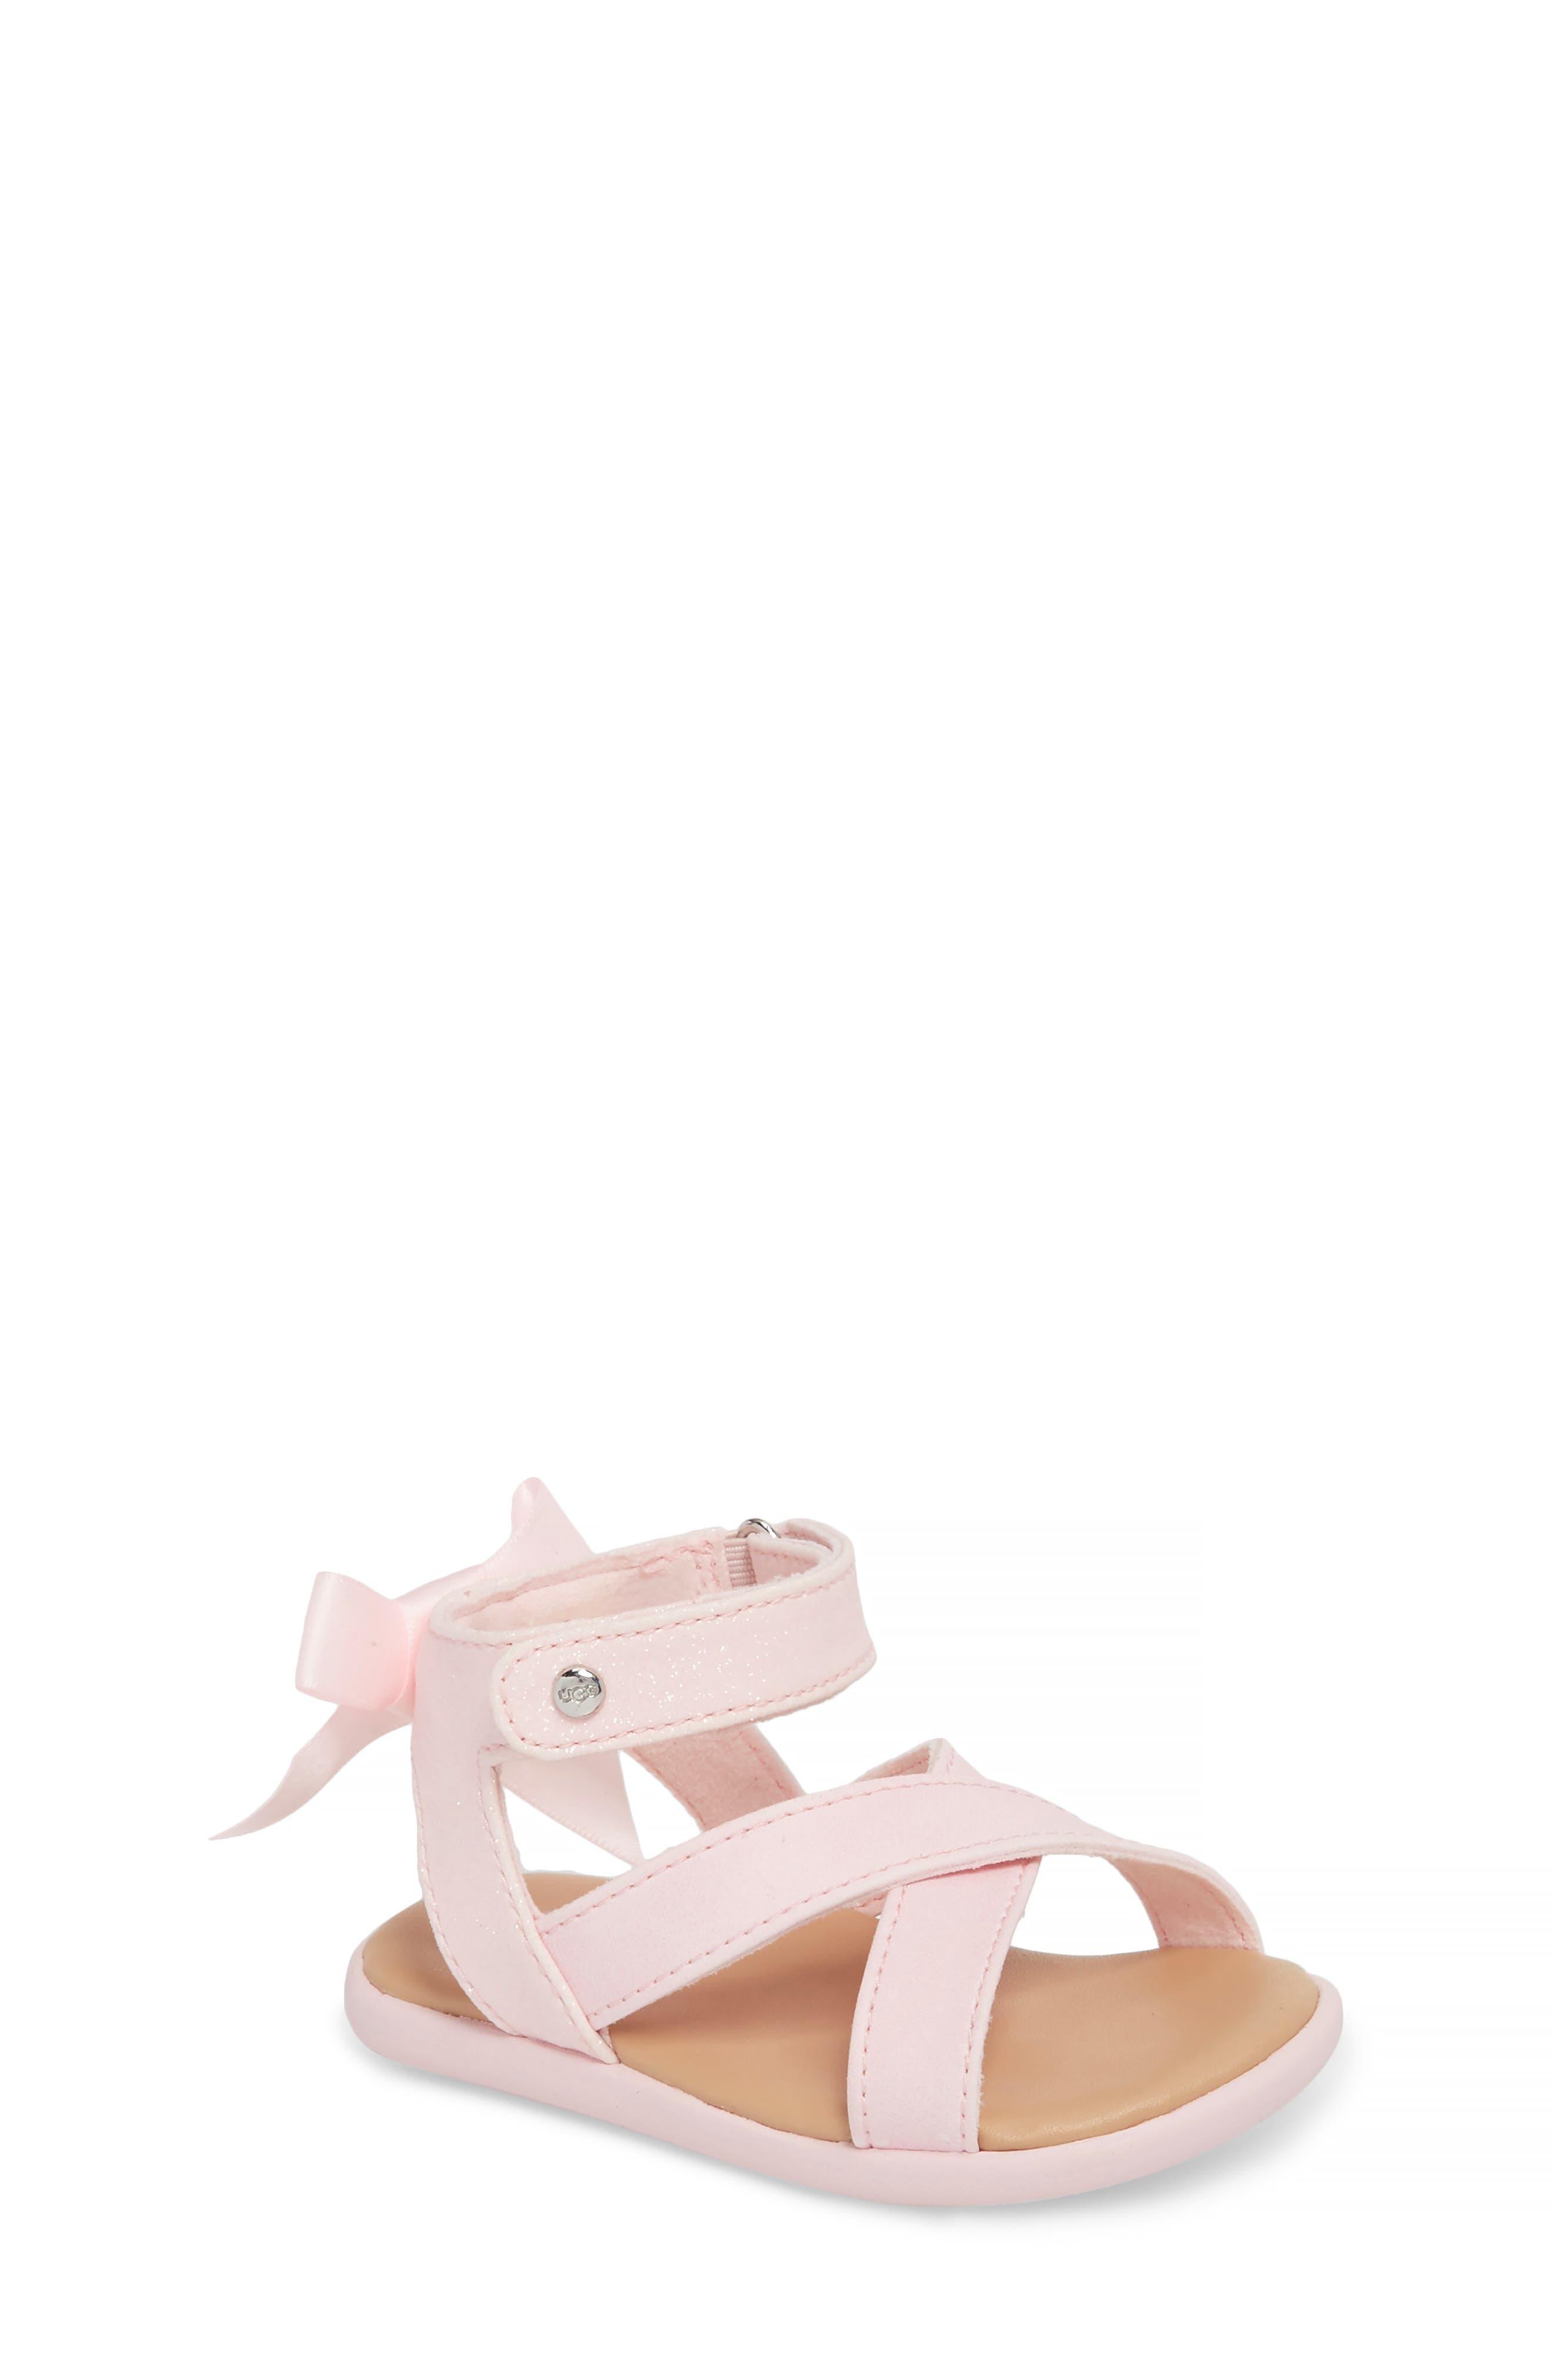 Main Image - UGG® Maggiepie Sparkles Sandal (Baby & Walker)